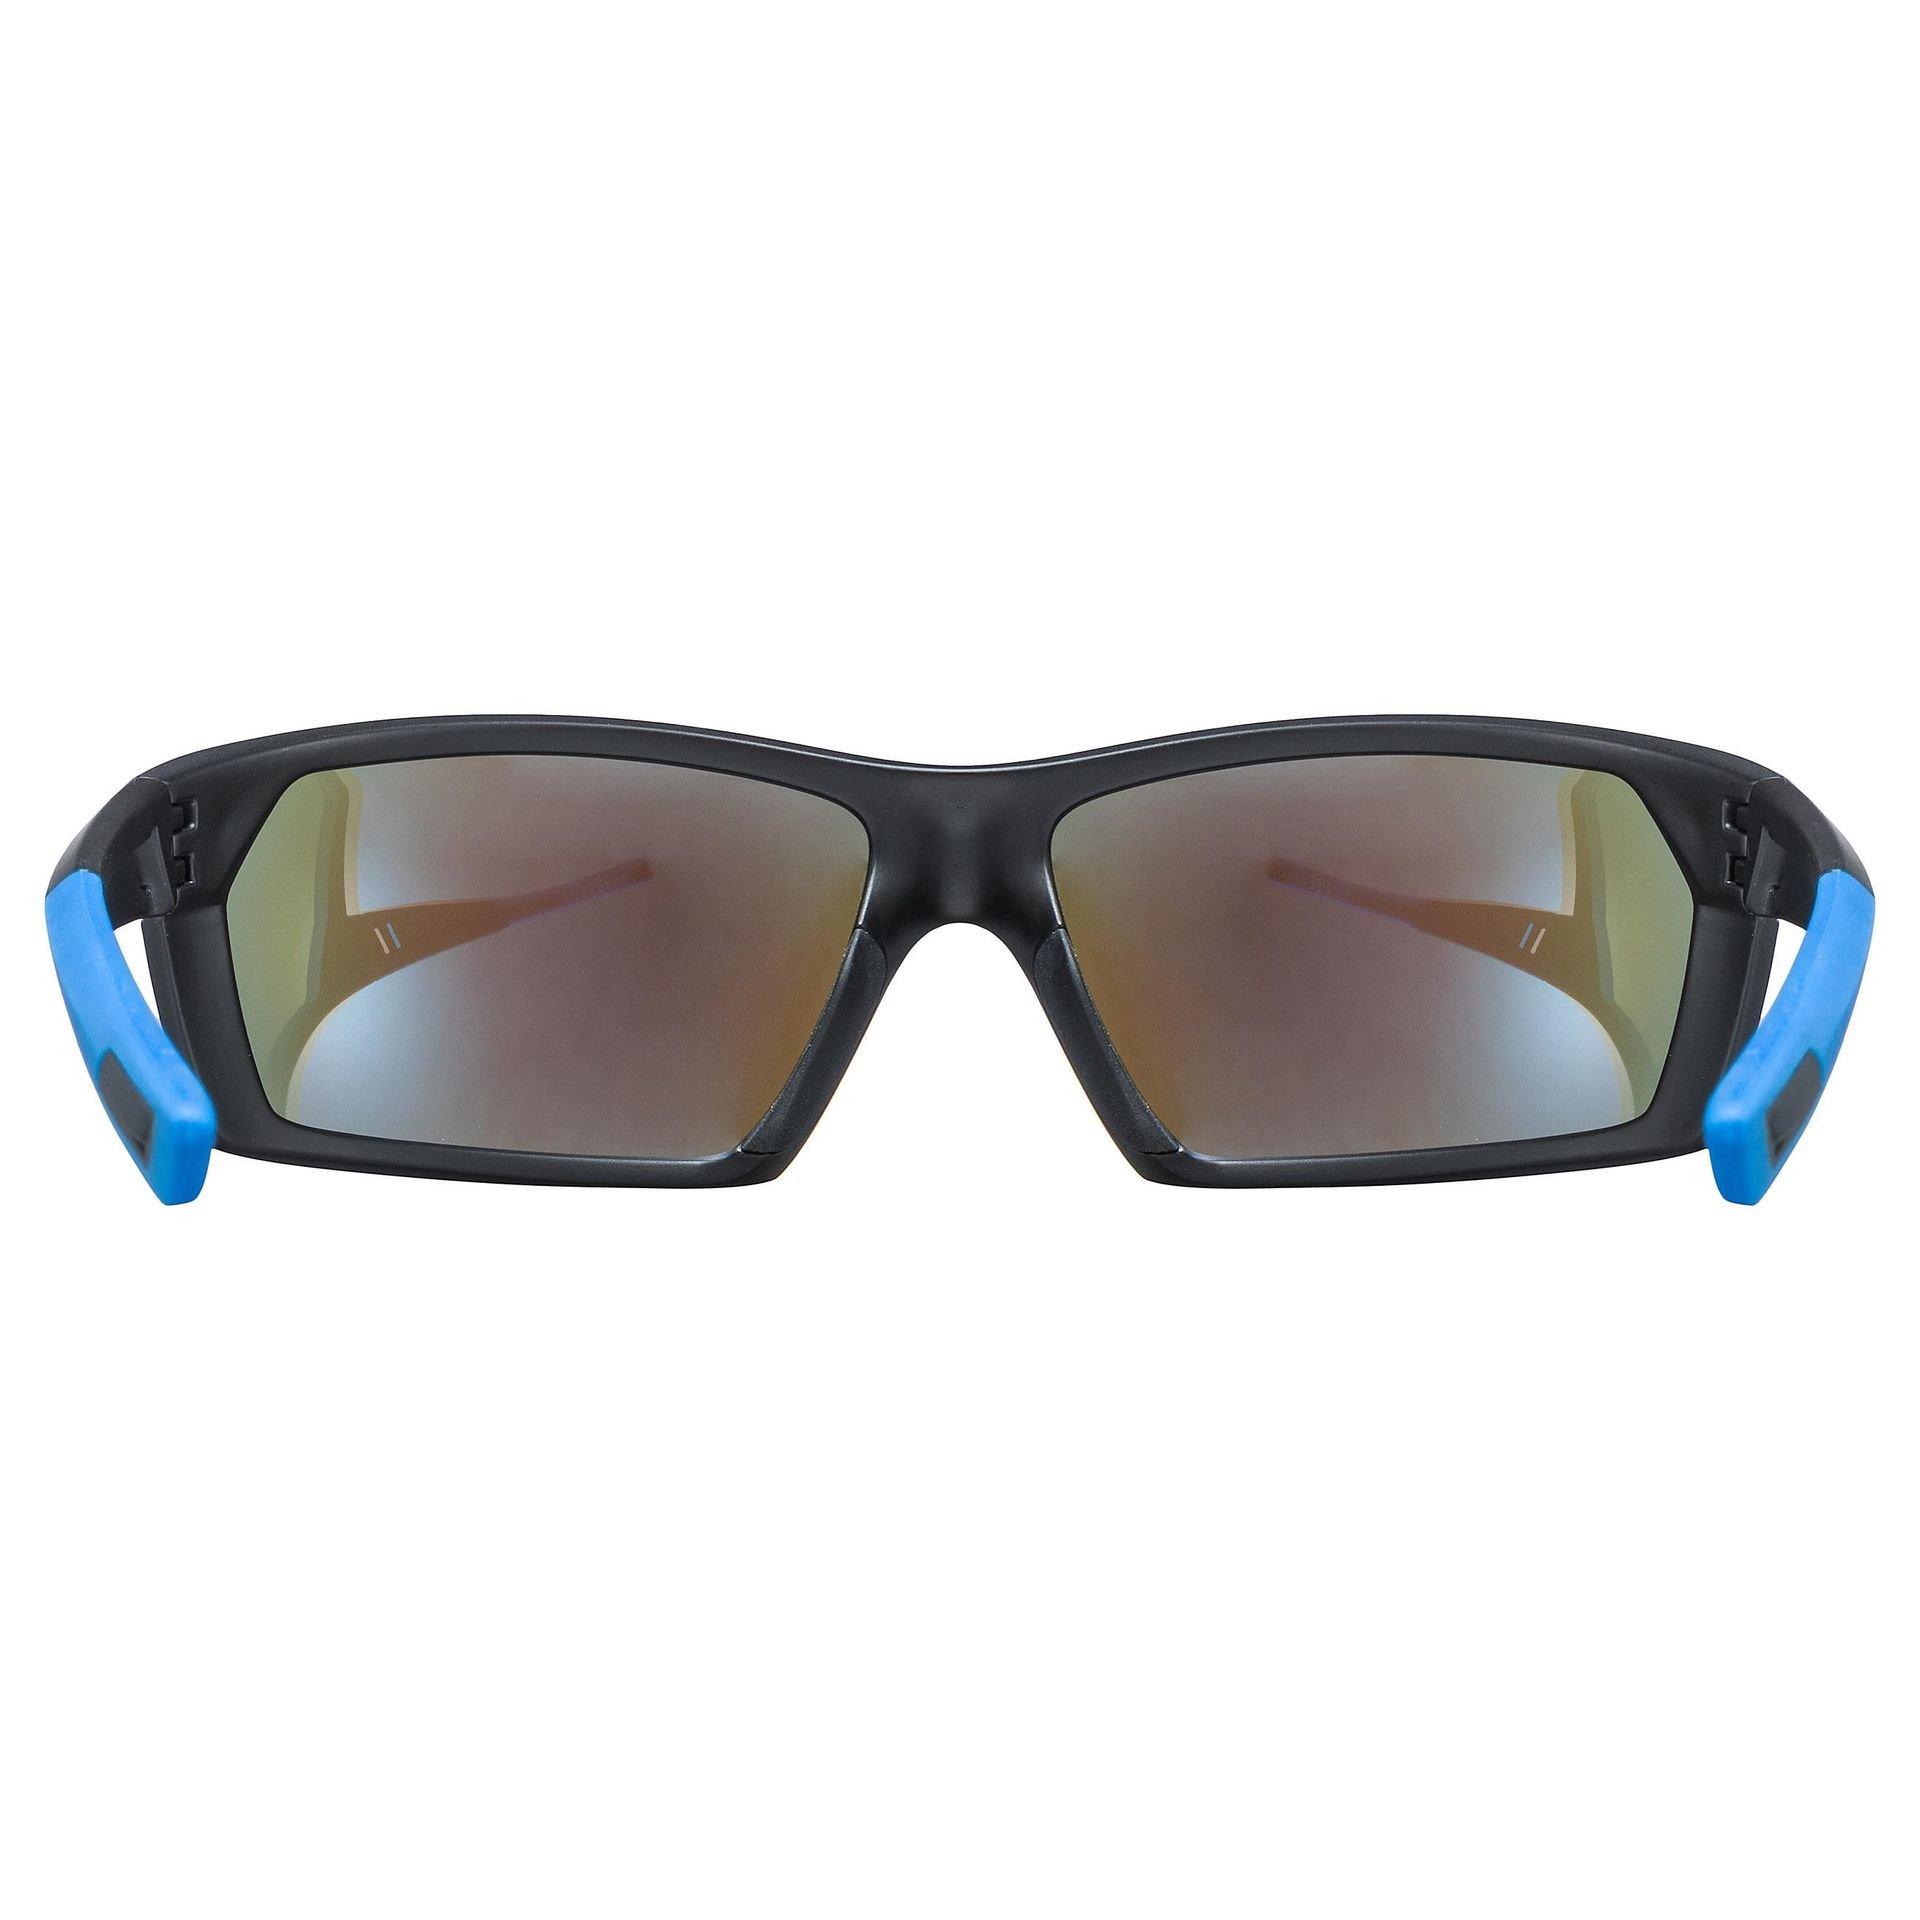 OKULARY UVEX SPORTSTYLE 225 BLACK BLUE MAT WNĘTRZE